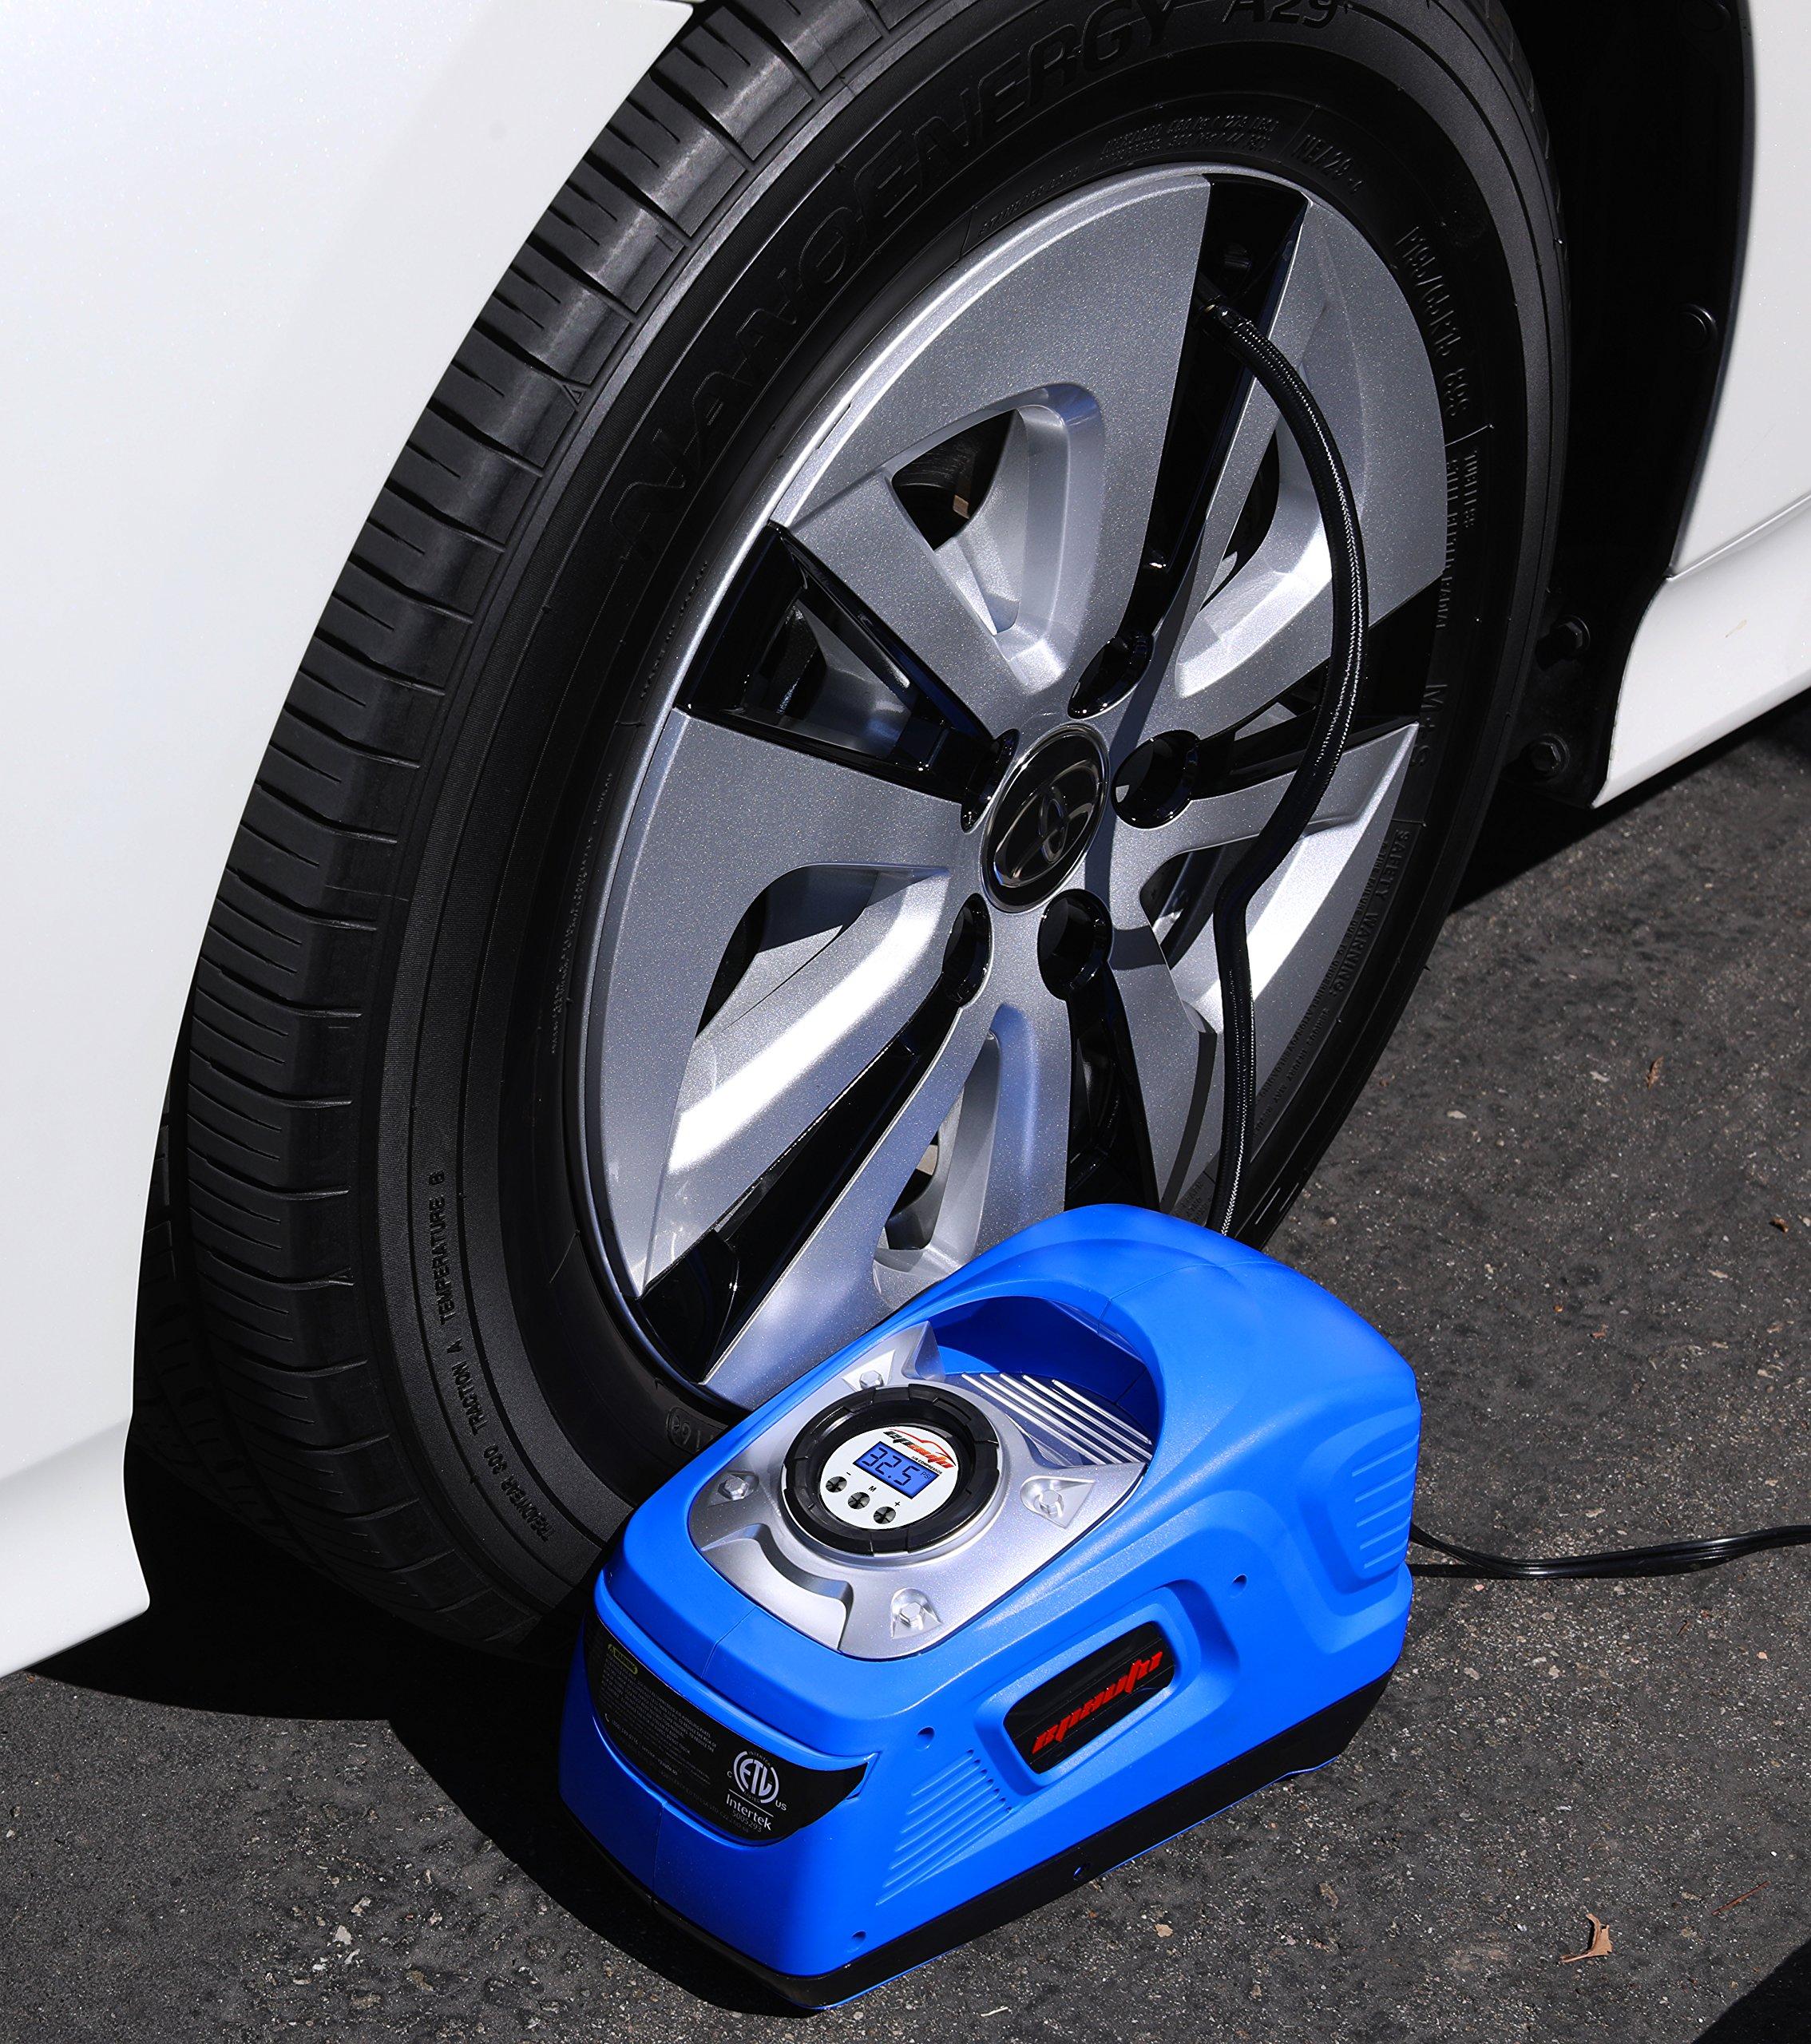 EPAuto AC 110V / DC 12V Dual Power Portable Air Compressor Pump w/Digital Tire Inflator, Support for Cigarette Lighter Socket (12V) and Home Outlet (110V) by EPAuto (Image #4)